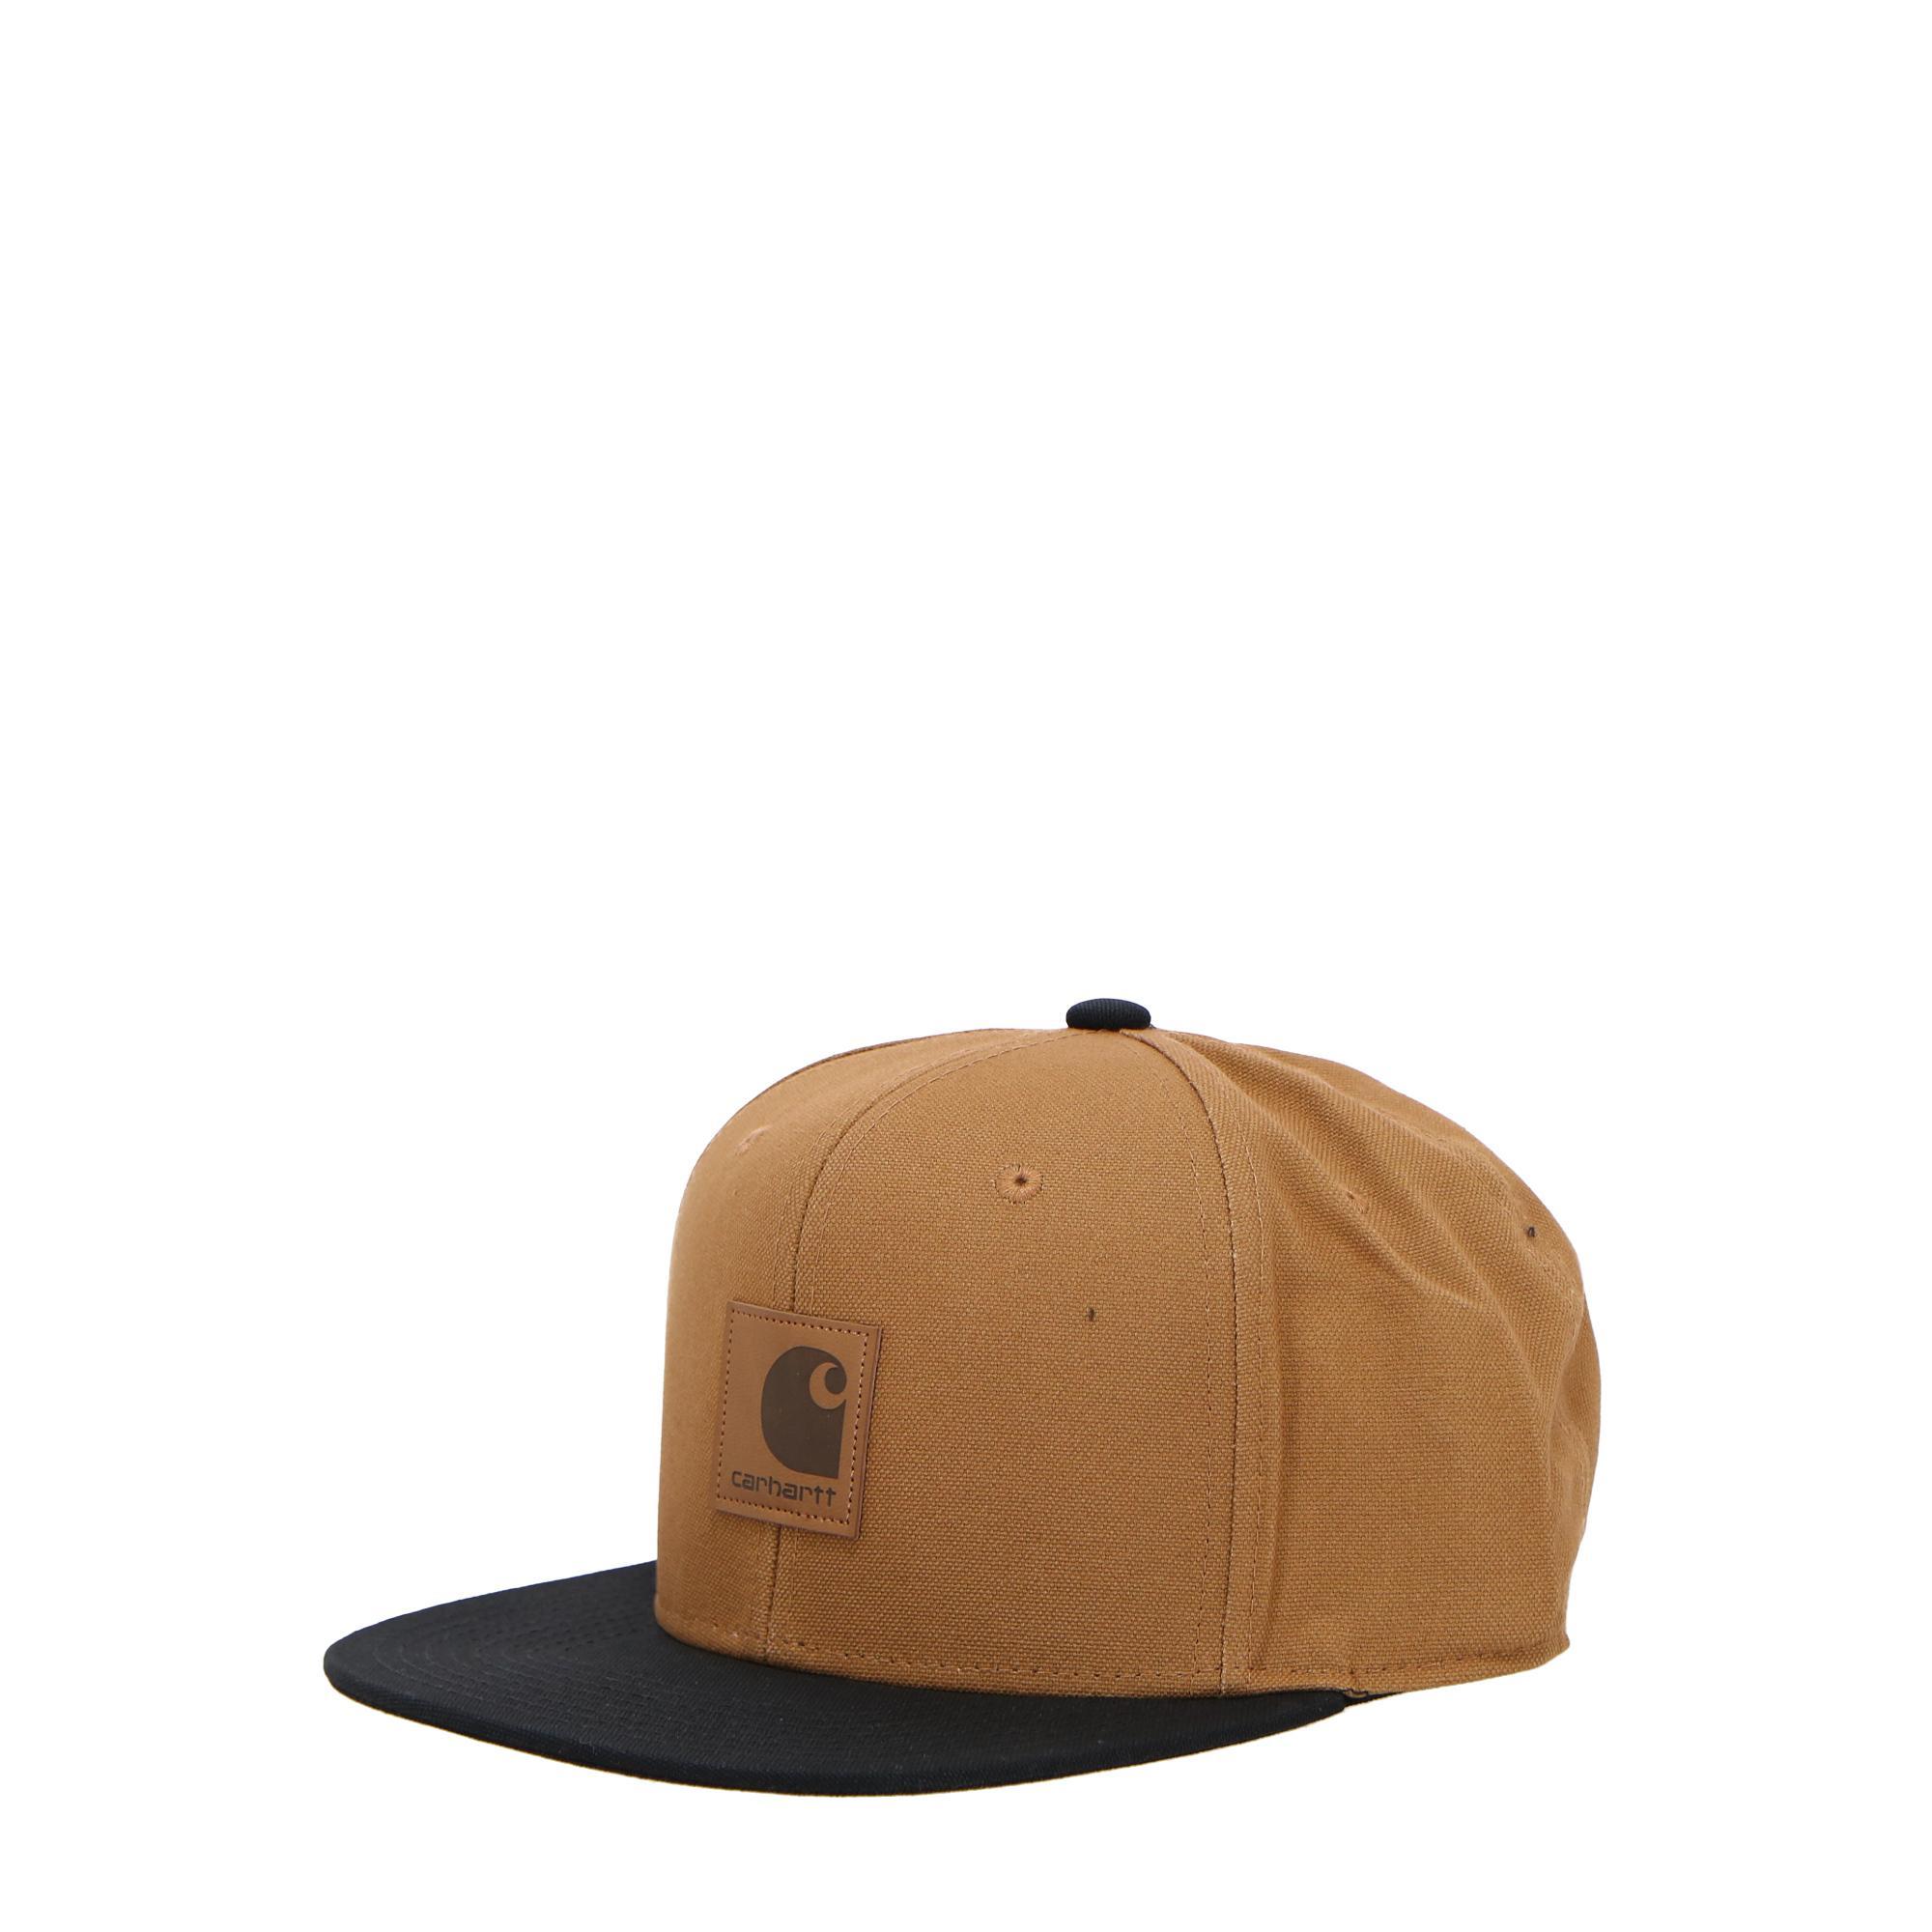 Carhartt Logo Cap Bi-colored Hamilton brown black